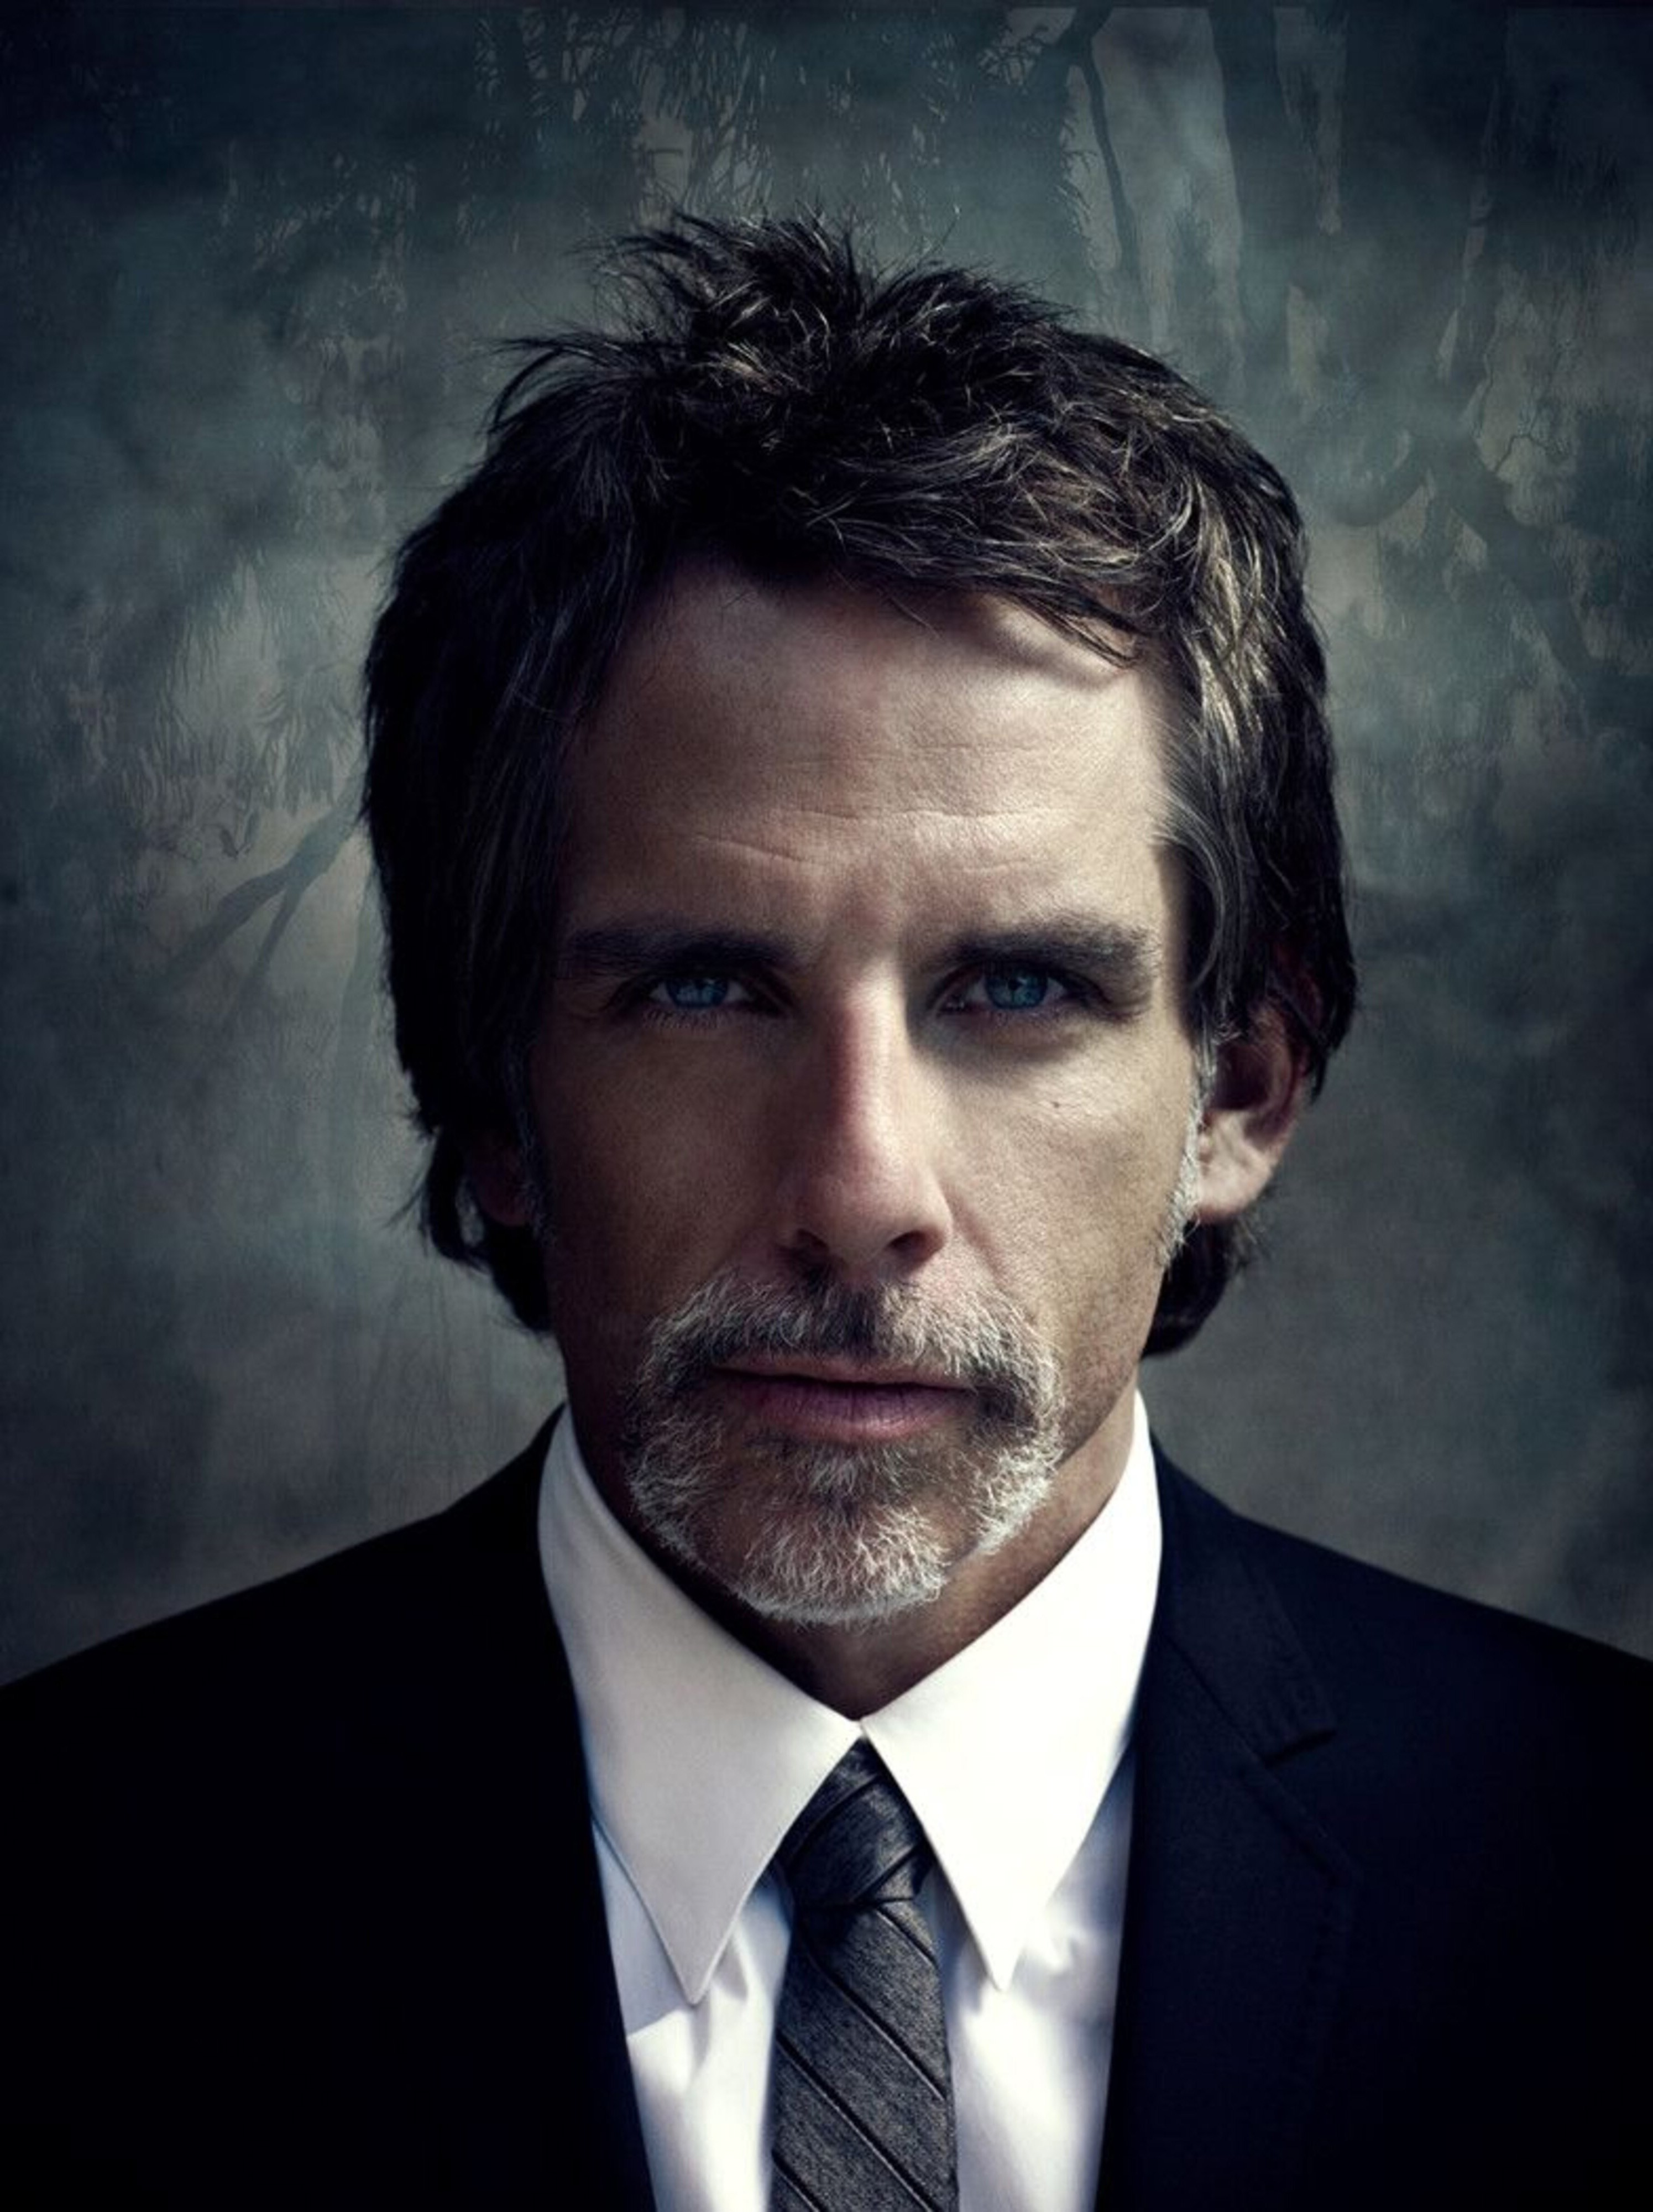 Ben Stiller's handlebar mustache style.